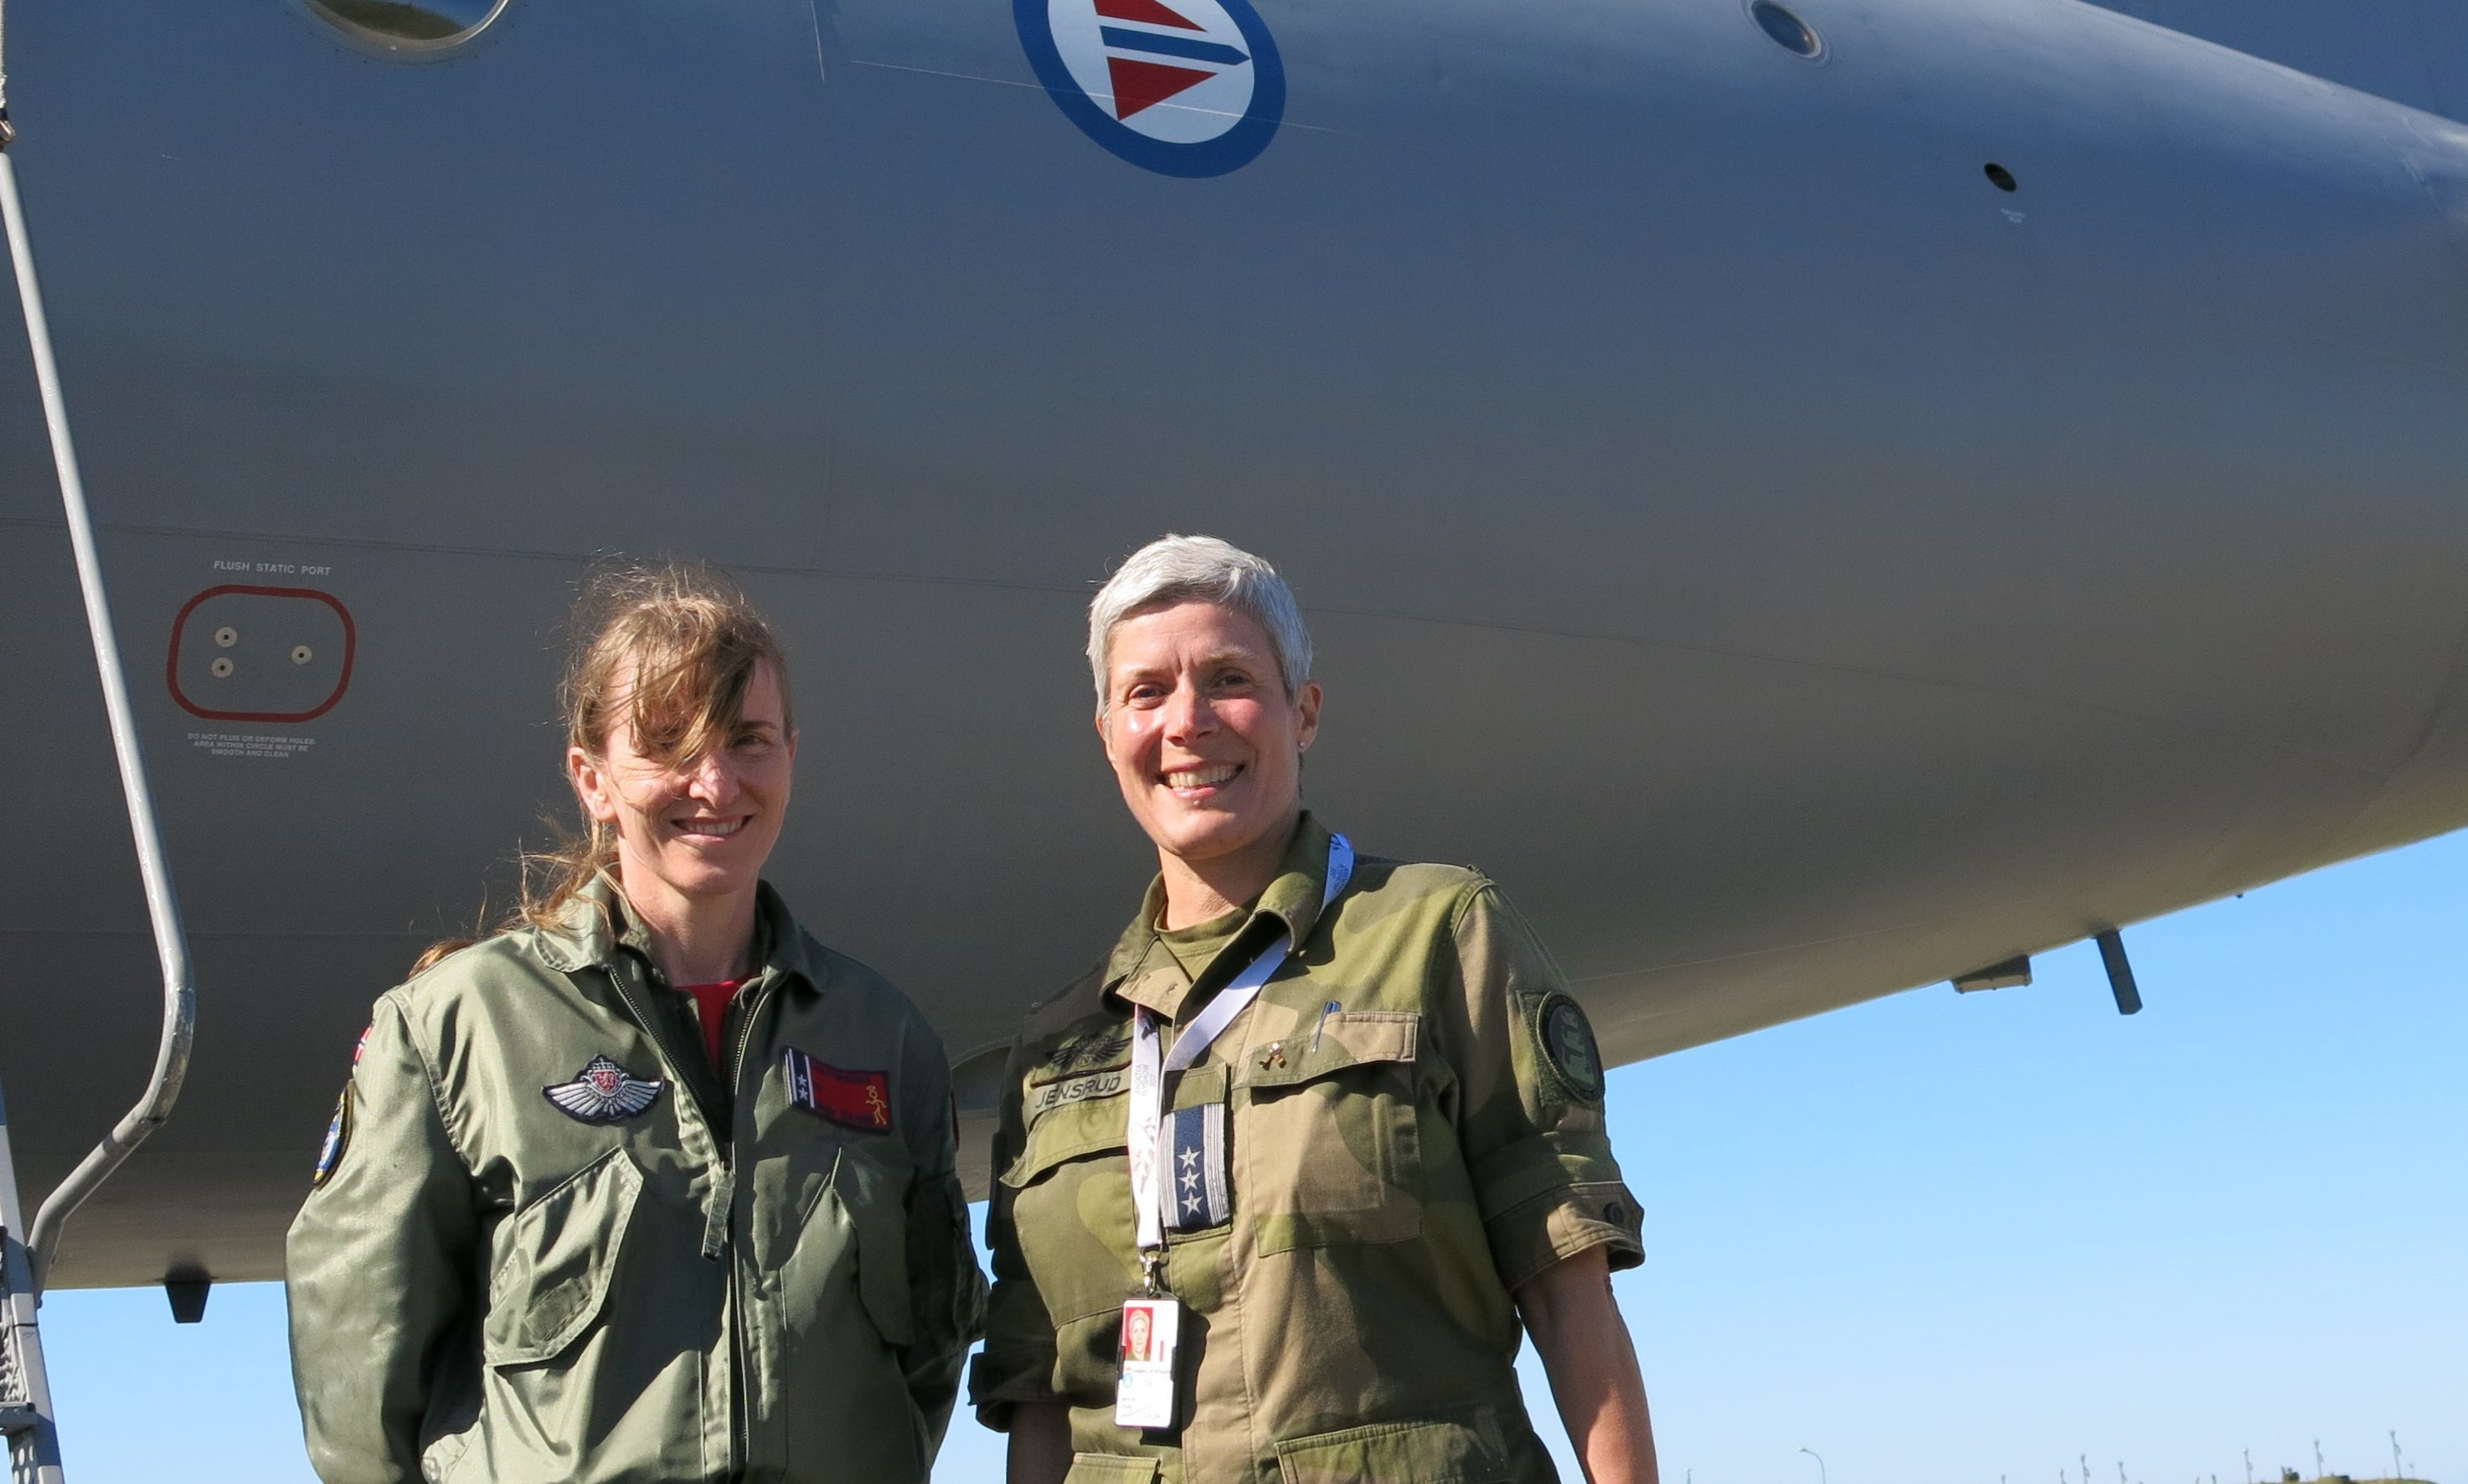 Lt Col Christen Pedersen, commanding officer of 333 Squadron and Col Invgild Jensrud, commanding officer of Andoya Air Base greeted the Fife visitors